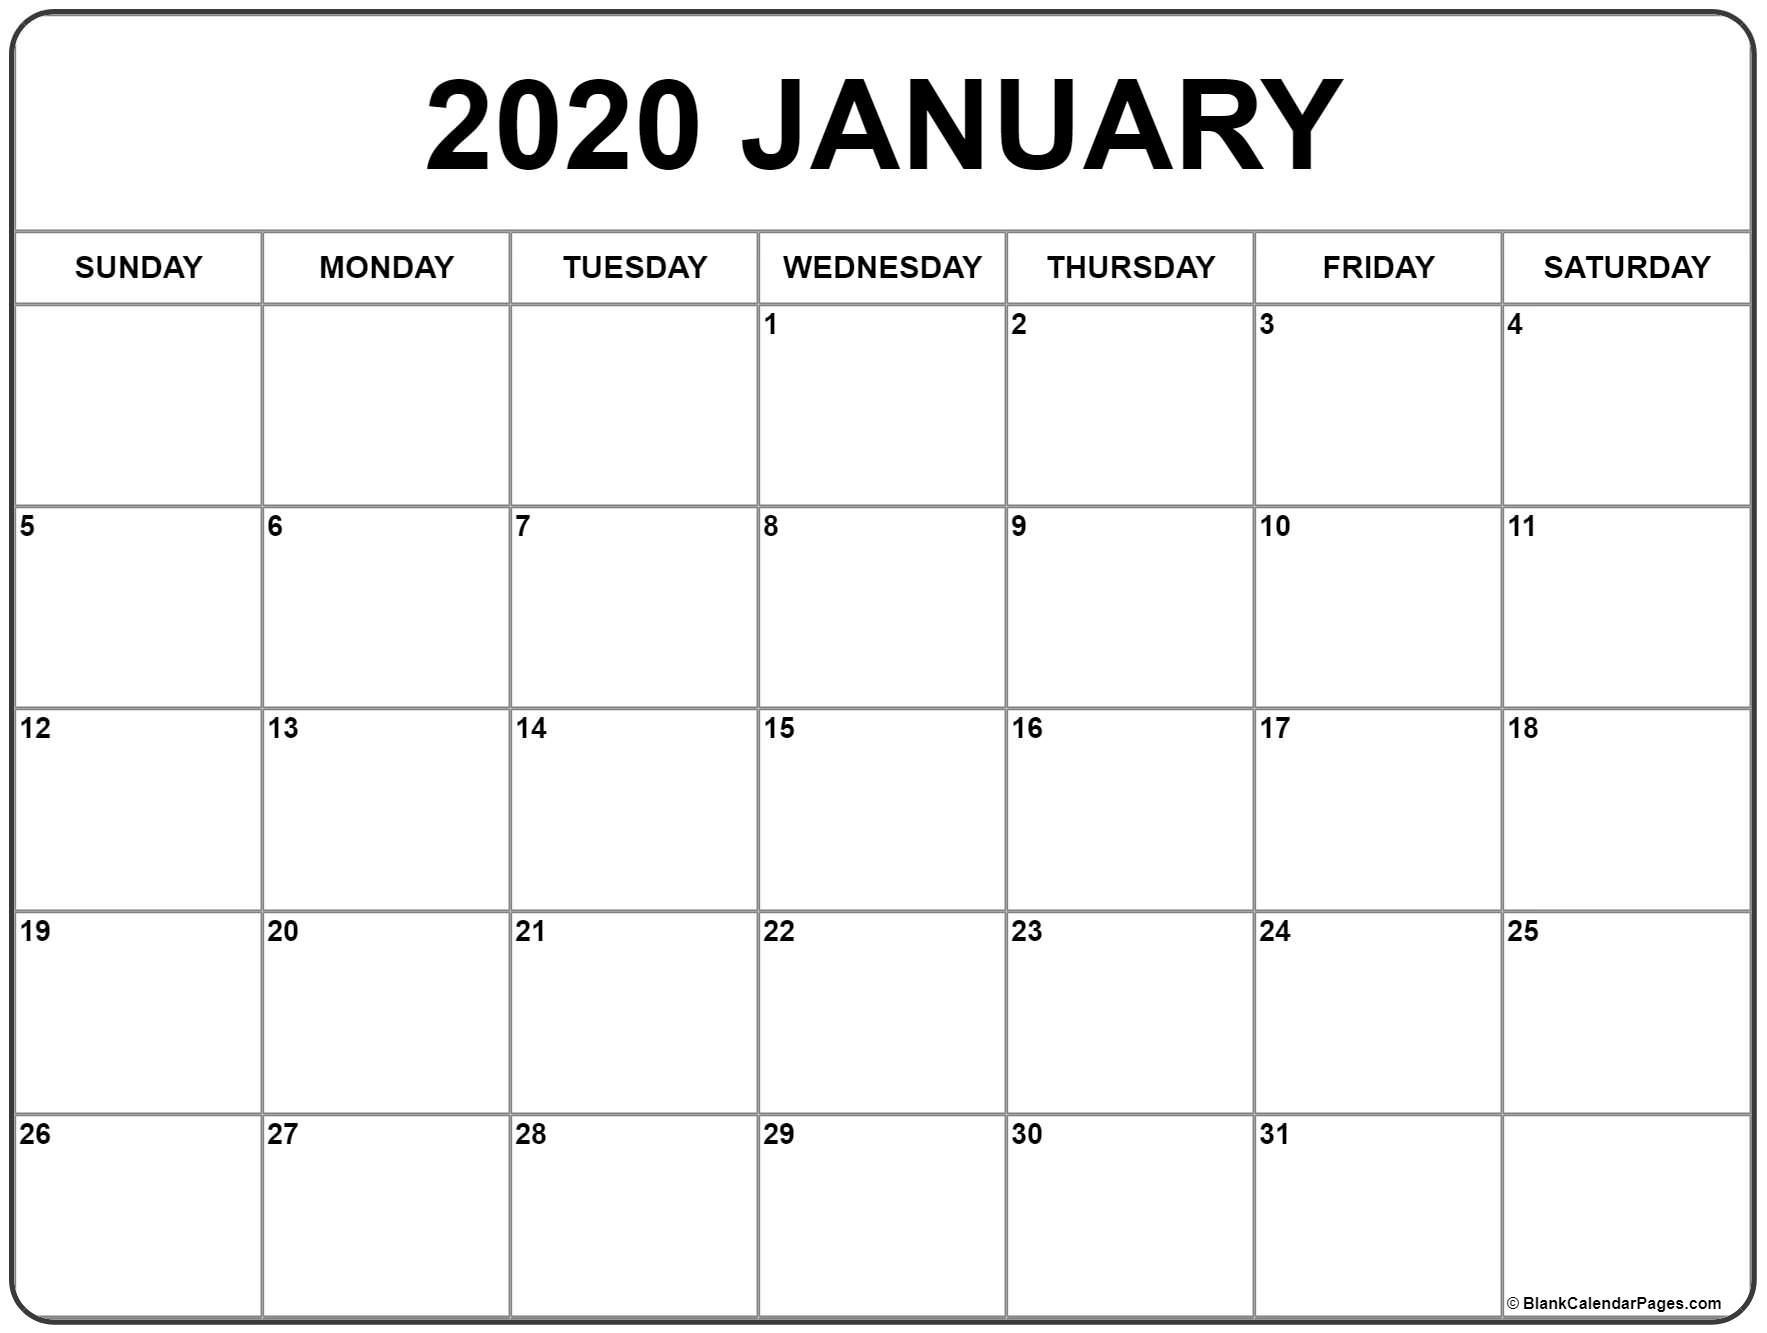 January 2020 Calendar | Free Printable Monthly Calendars-Free Printable January 2020 Calendar With Holidays